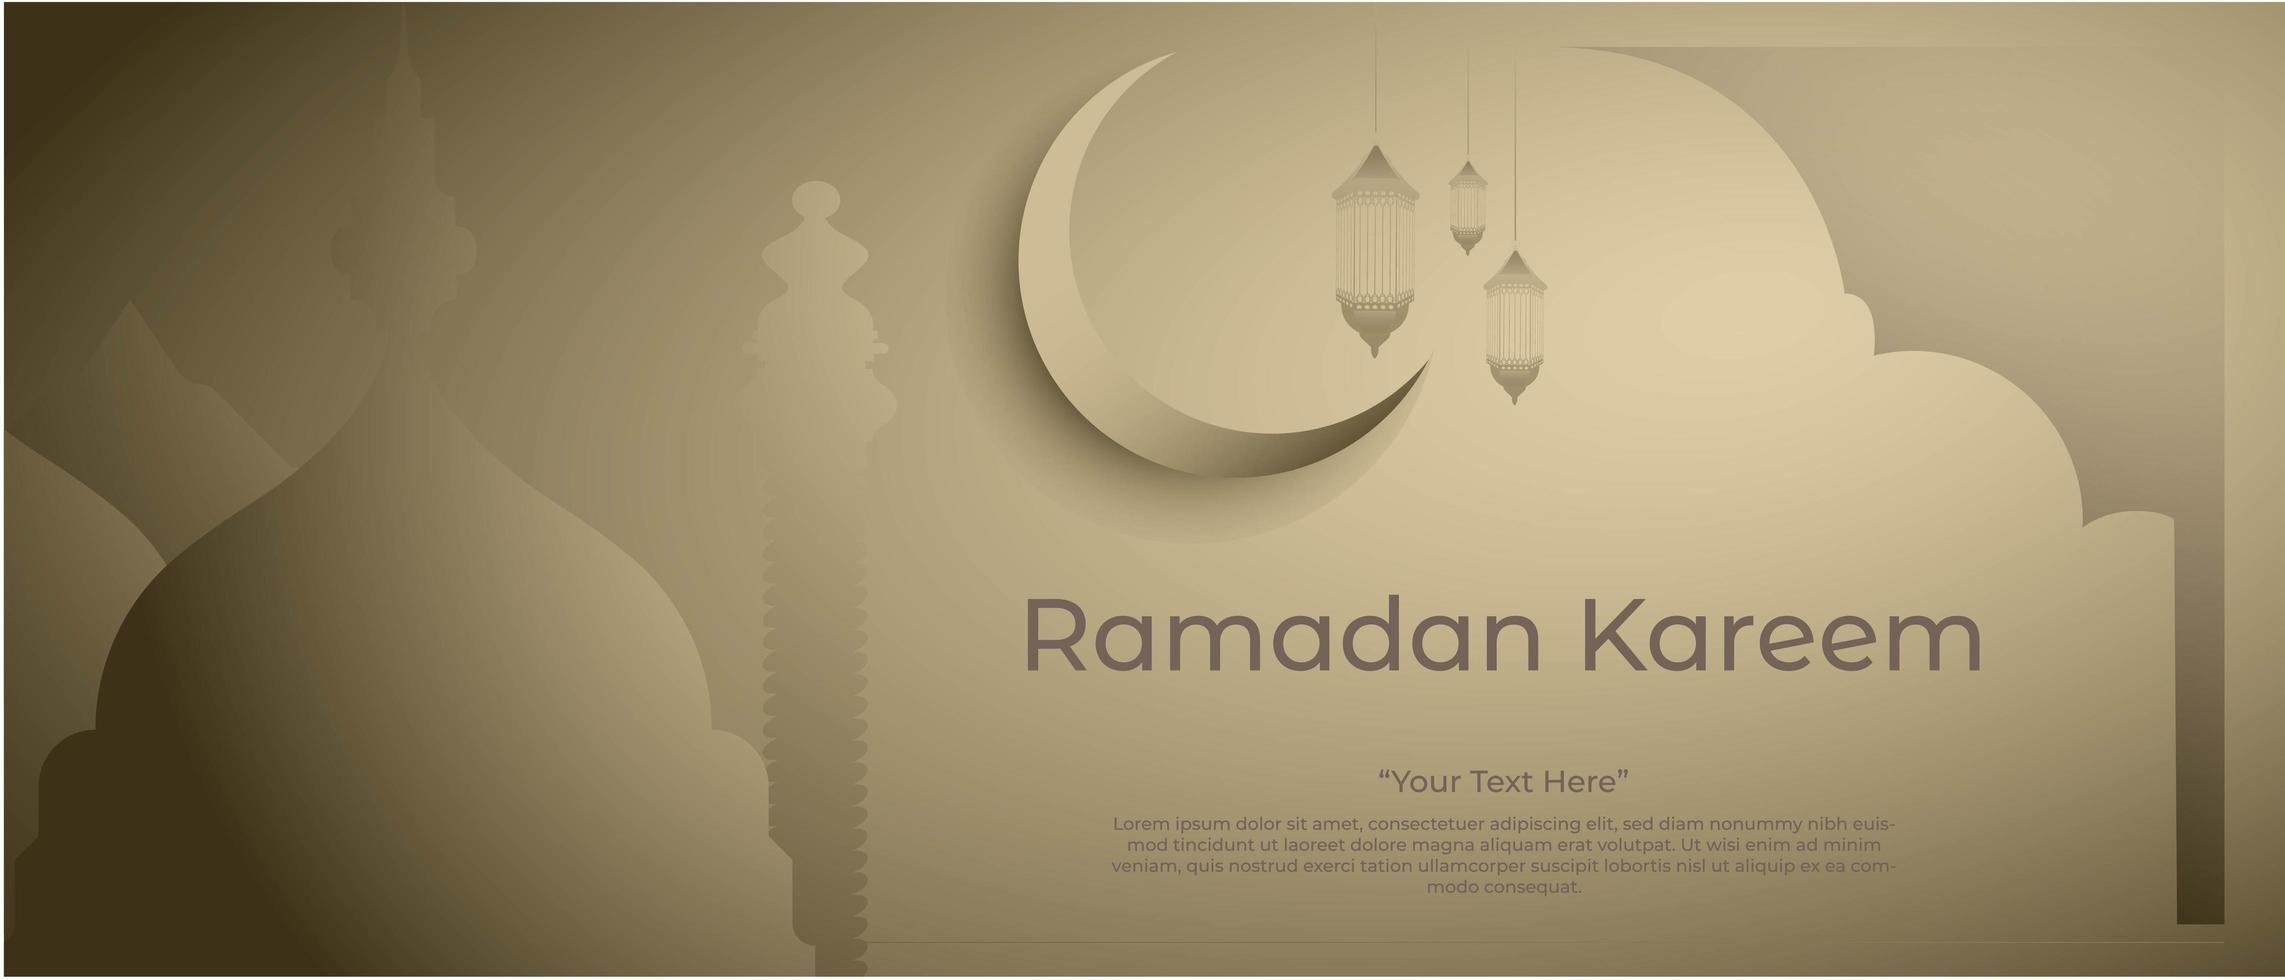 ramadan kareem achtergrond met moskee lantaarn en prachtige maan vector